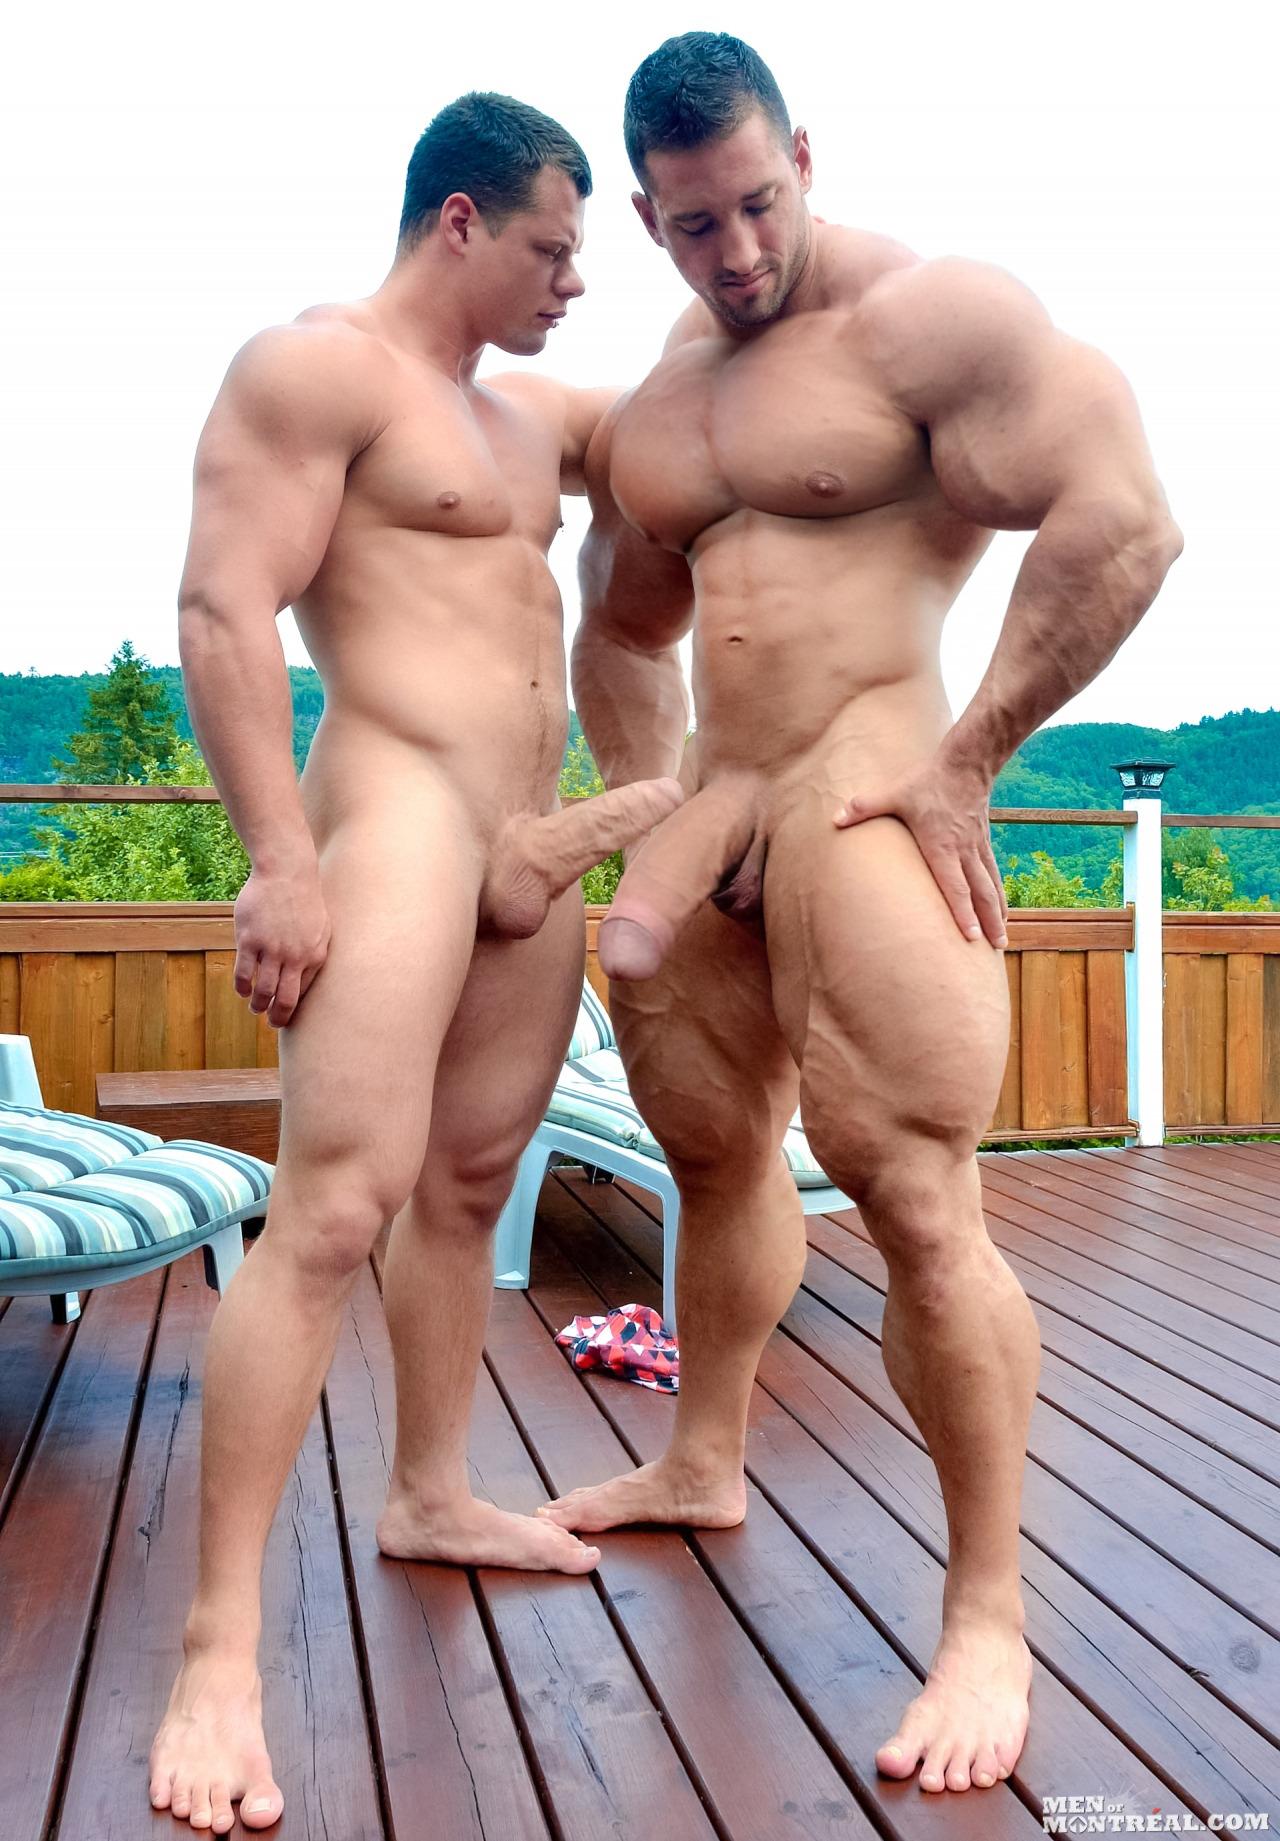 huge cock morphs tumblr